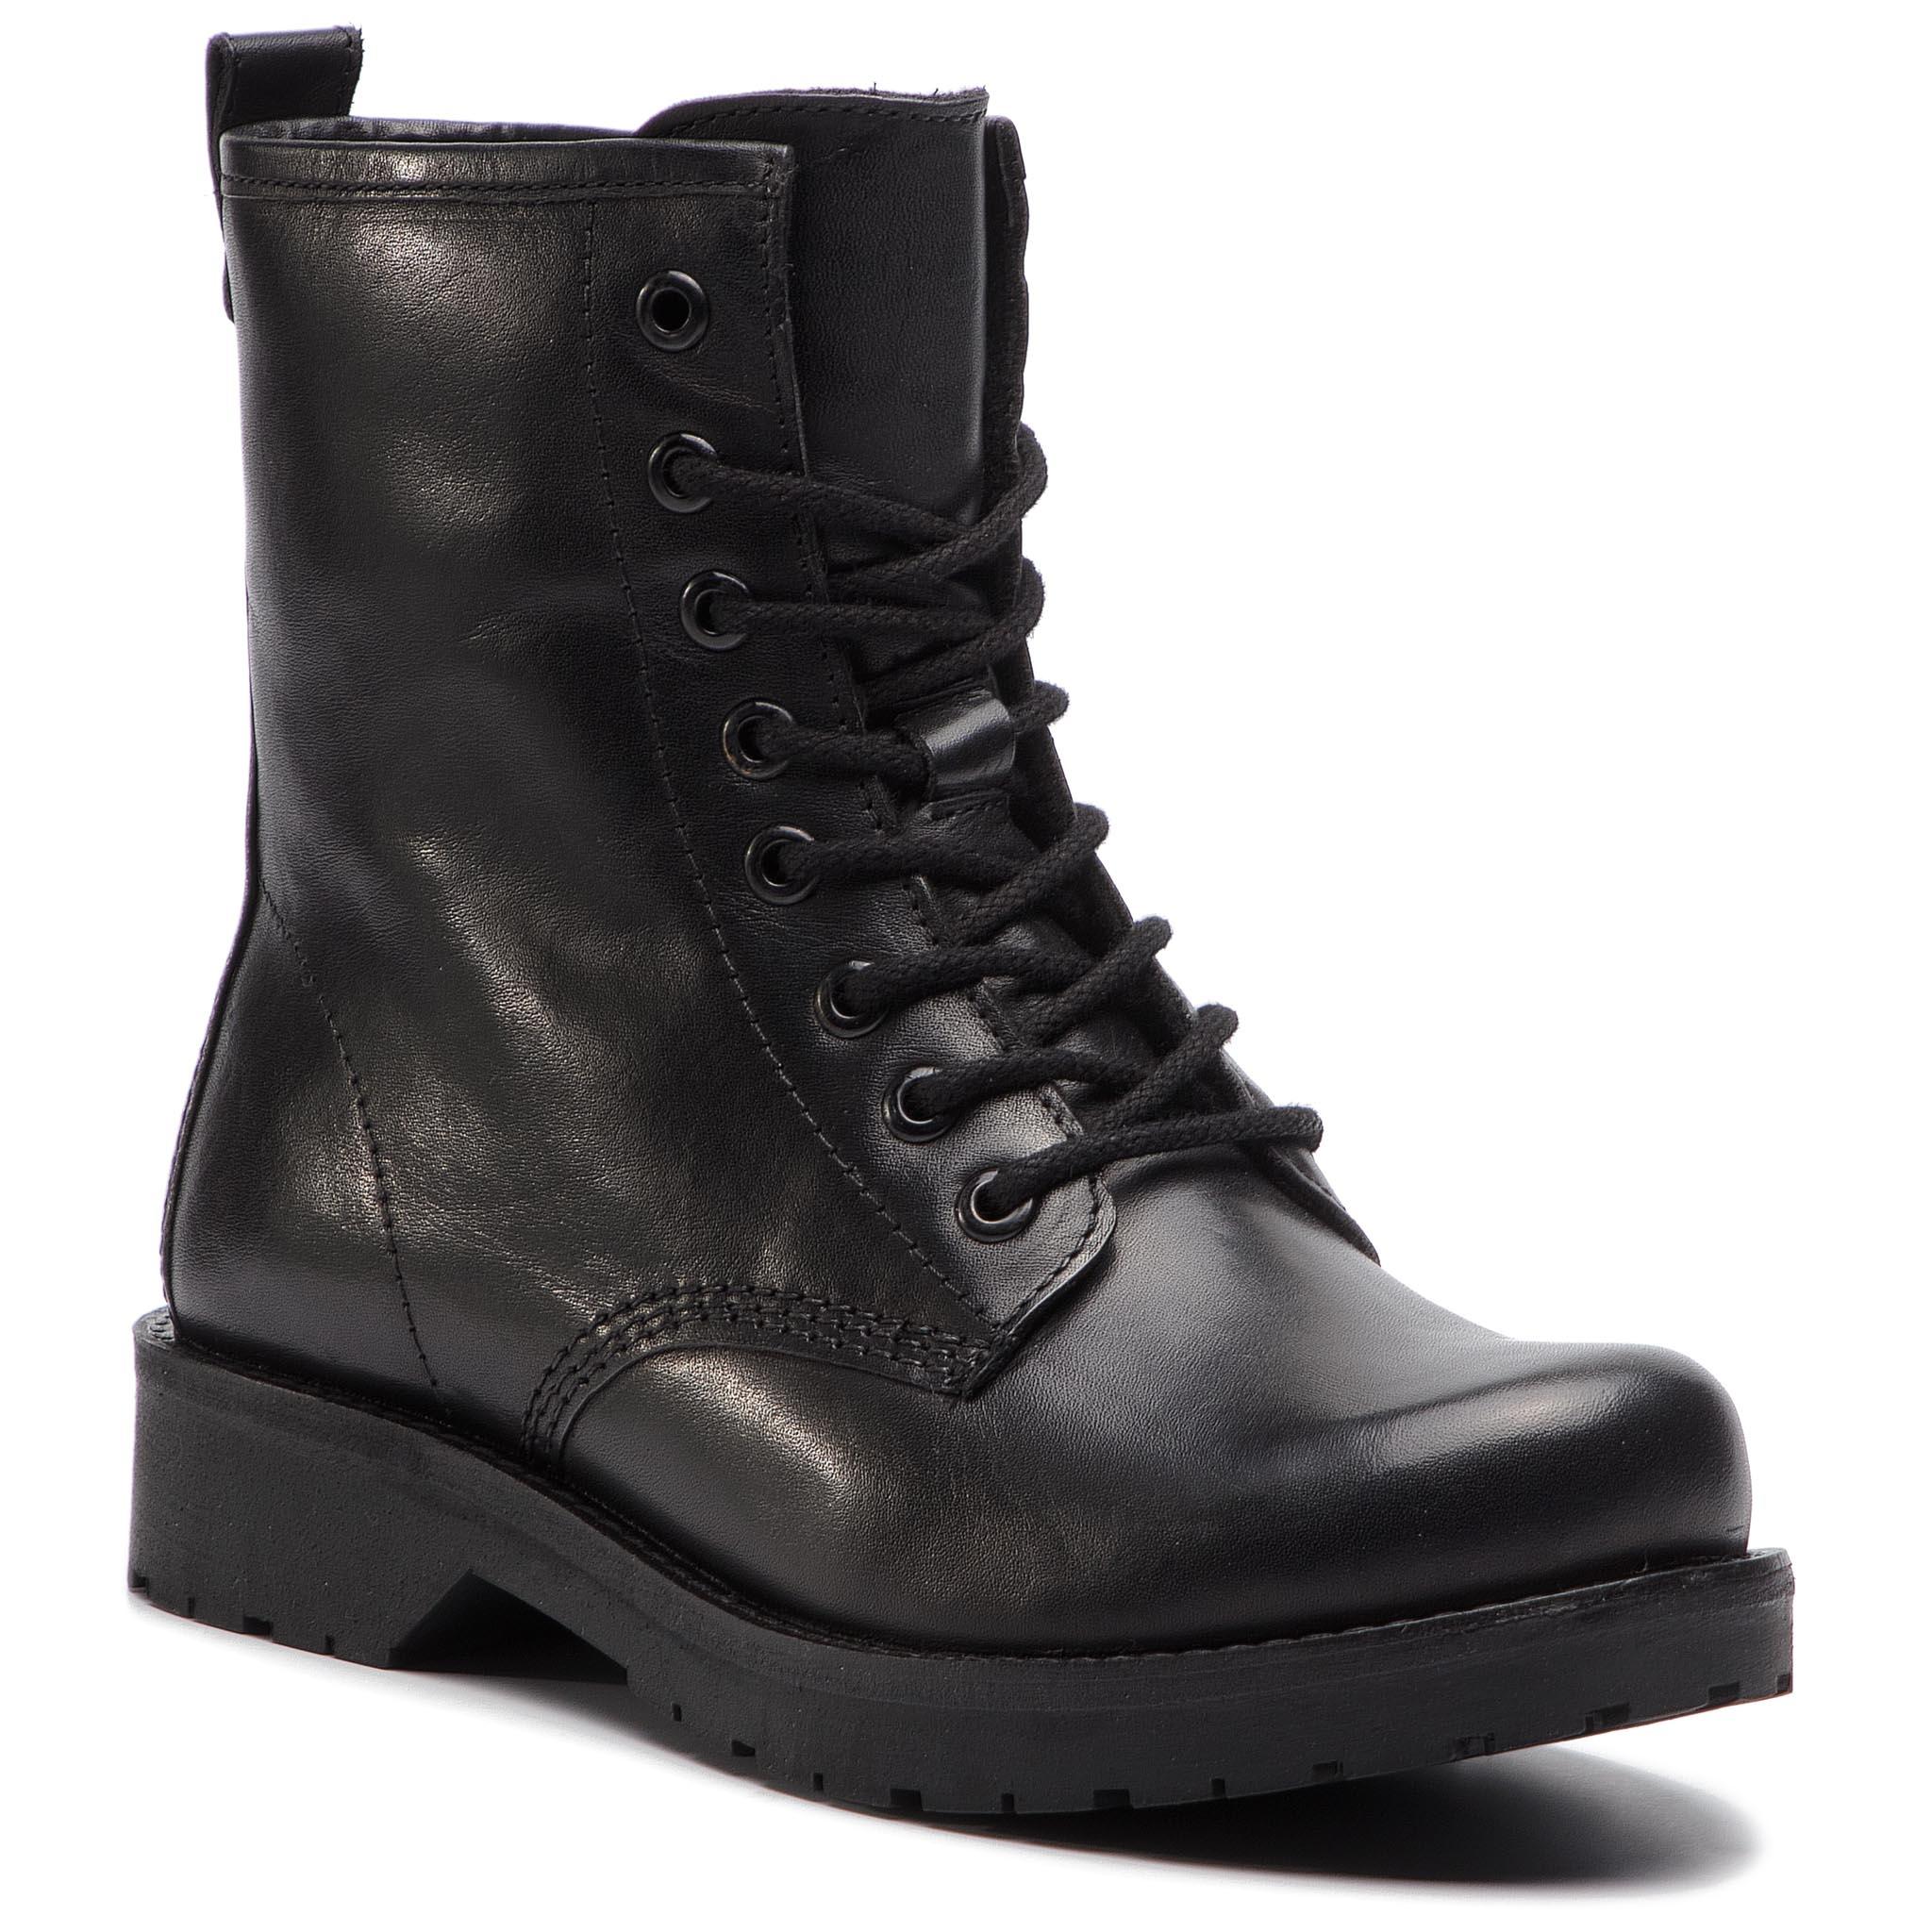 c2be7fb1f894 Boots SERGIO BARDI Trens FW127355018CC 101